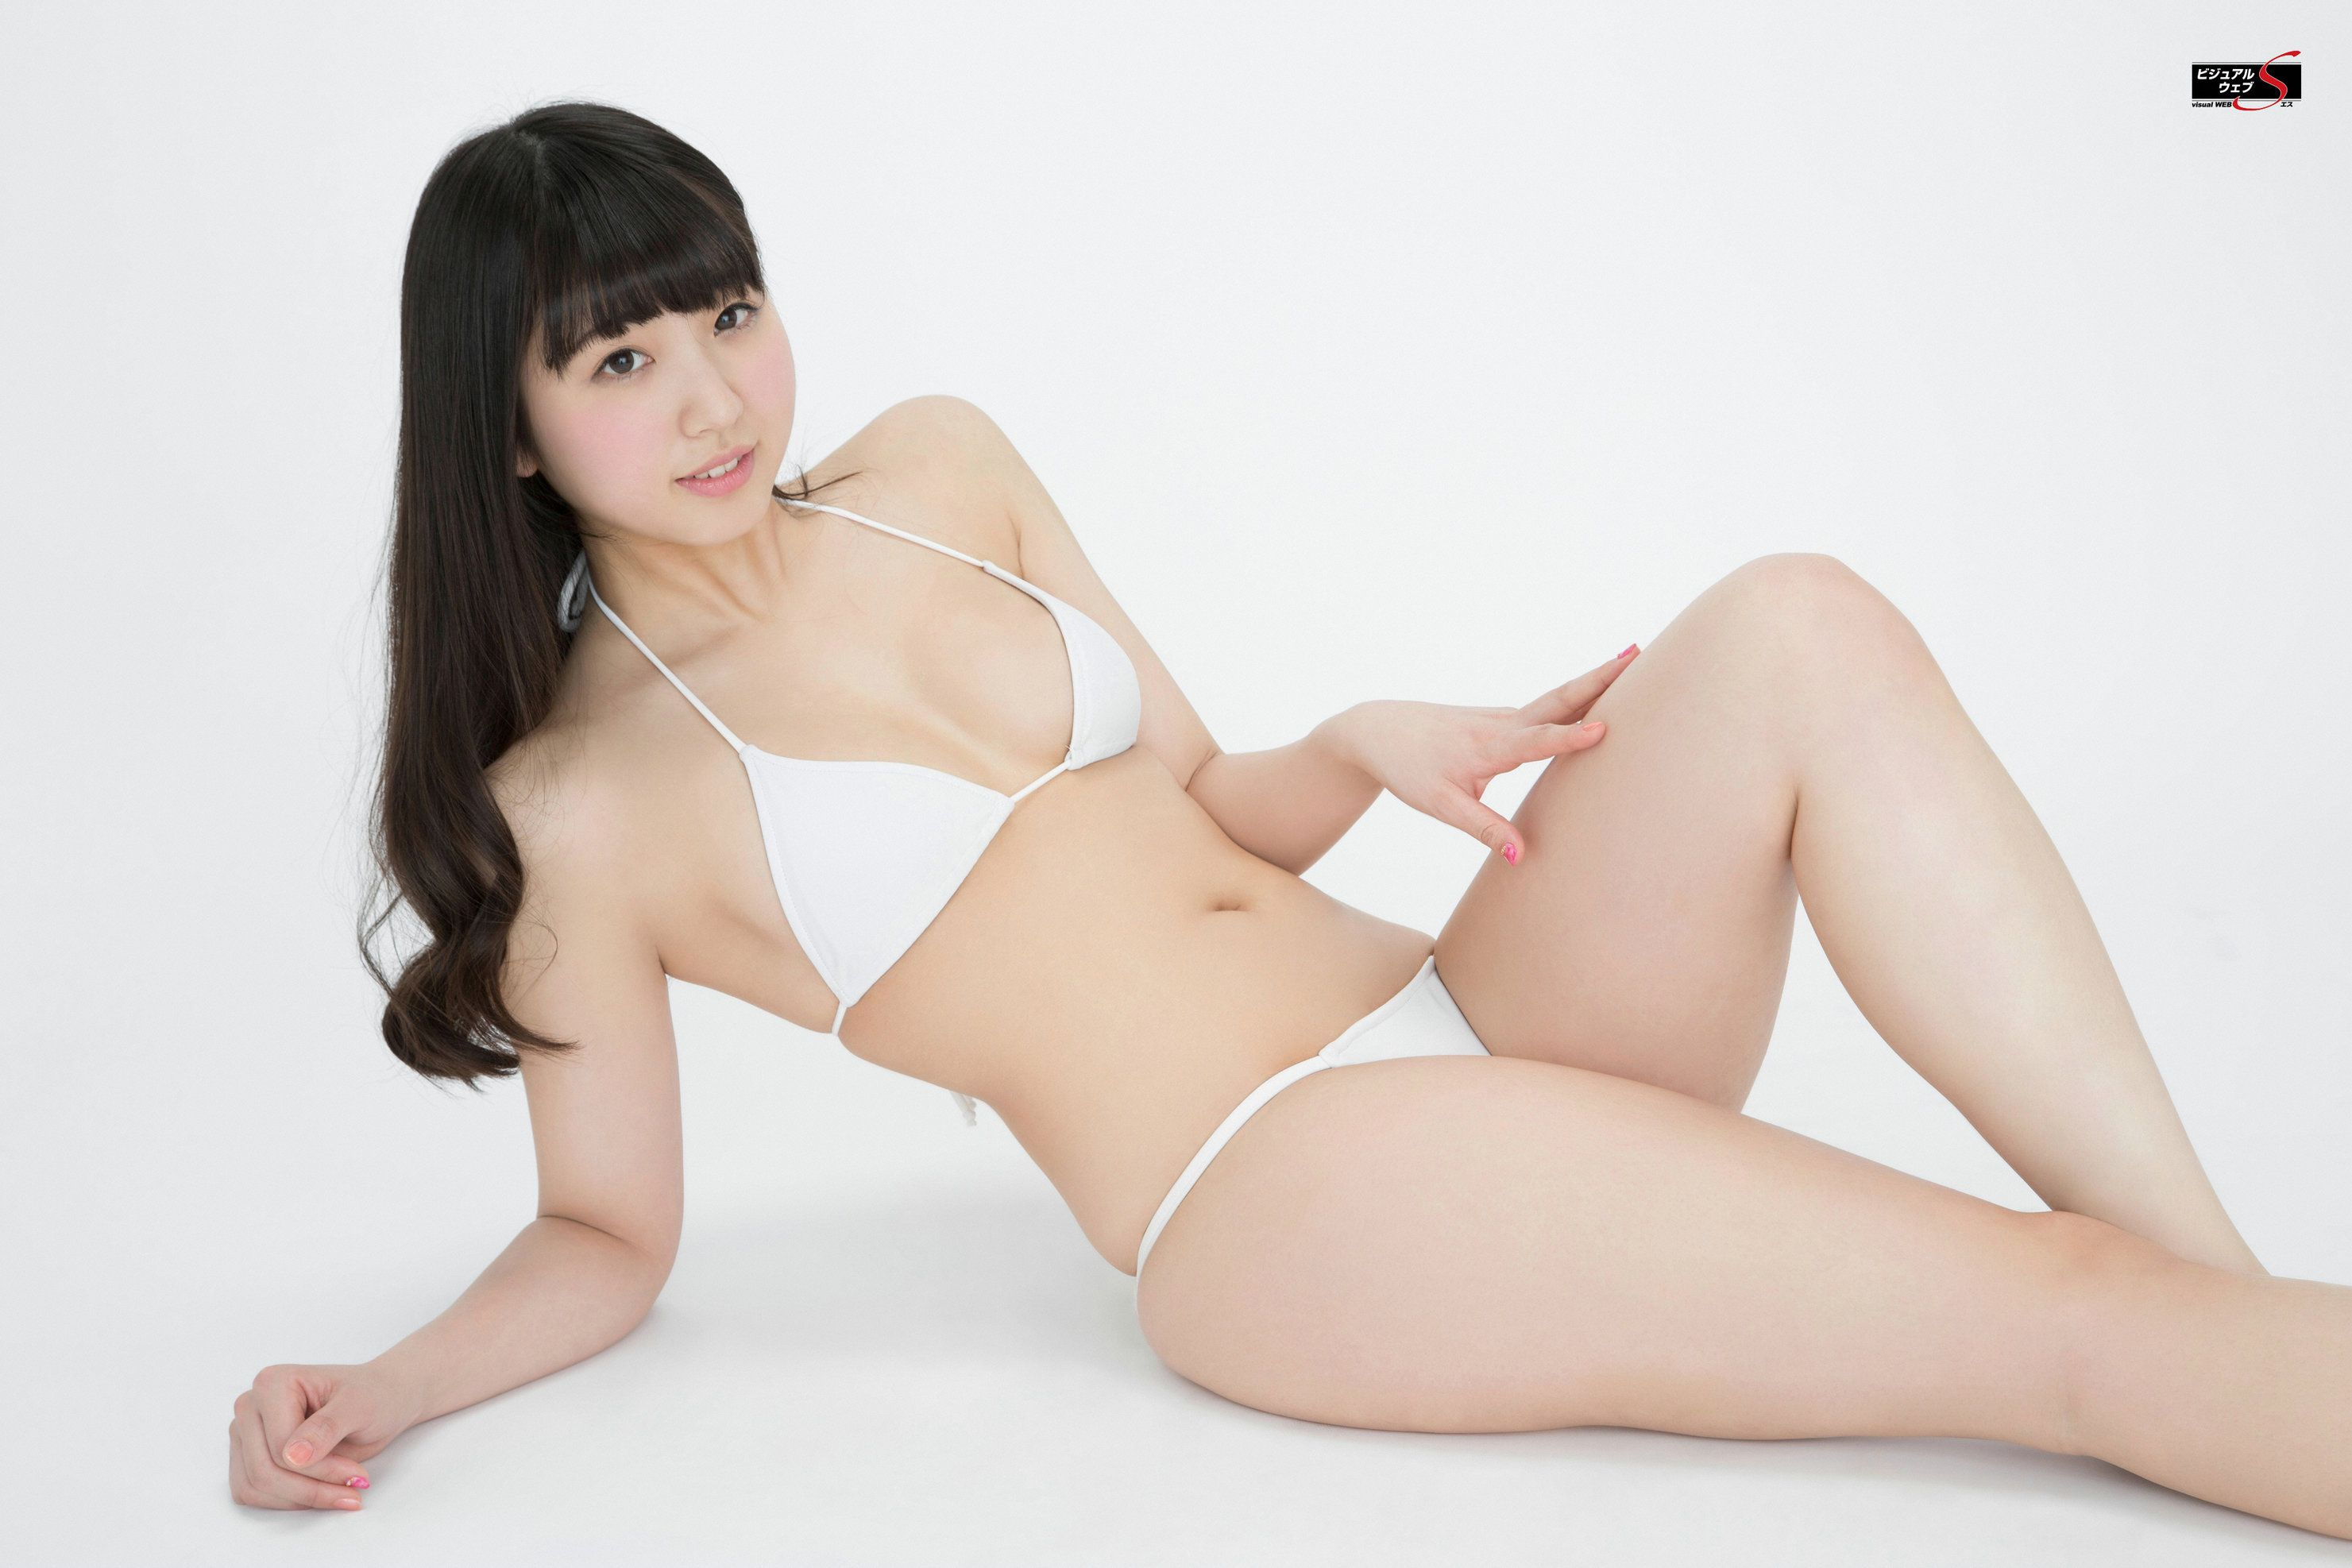 Paiarts muscular body Kanae Shiina 051